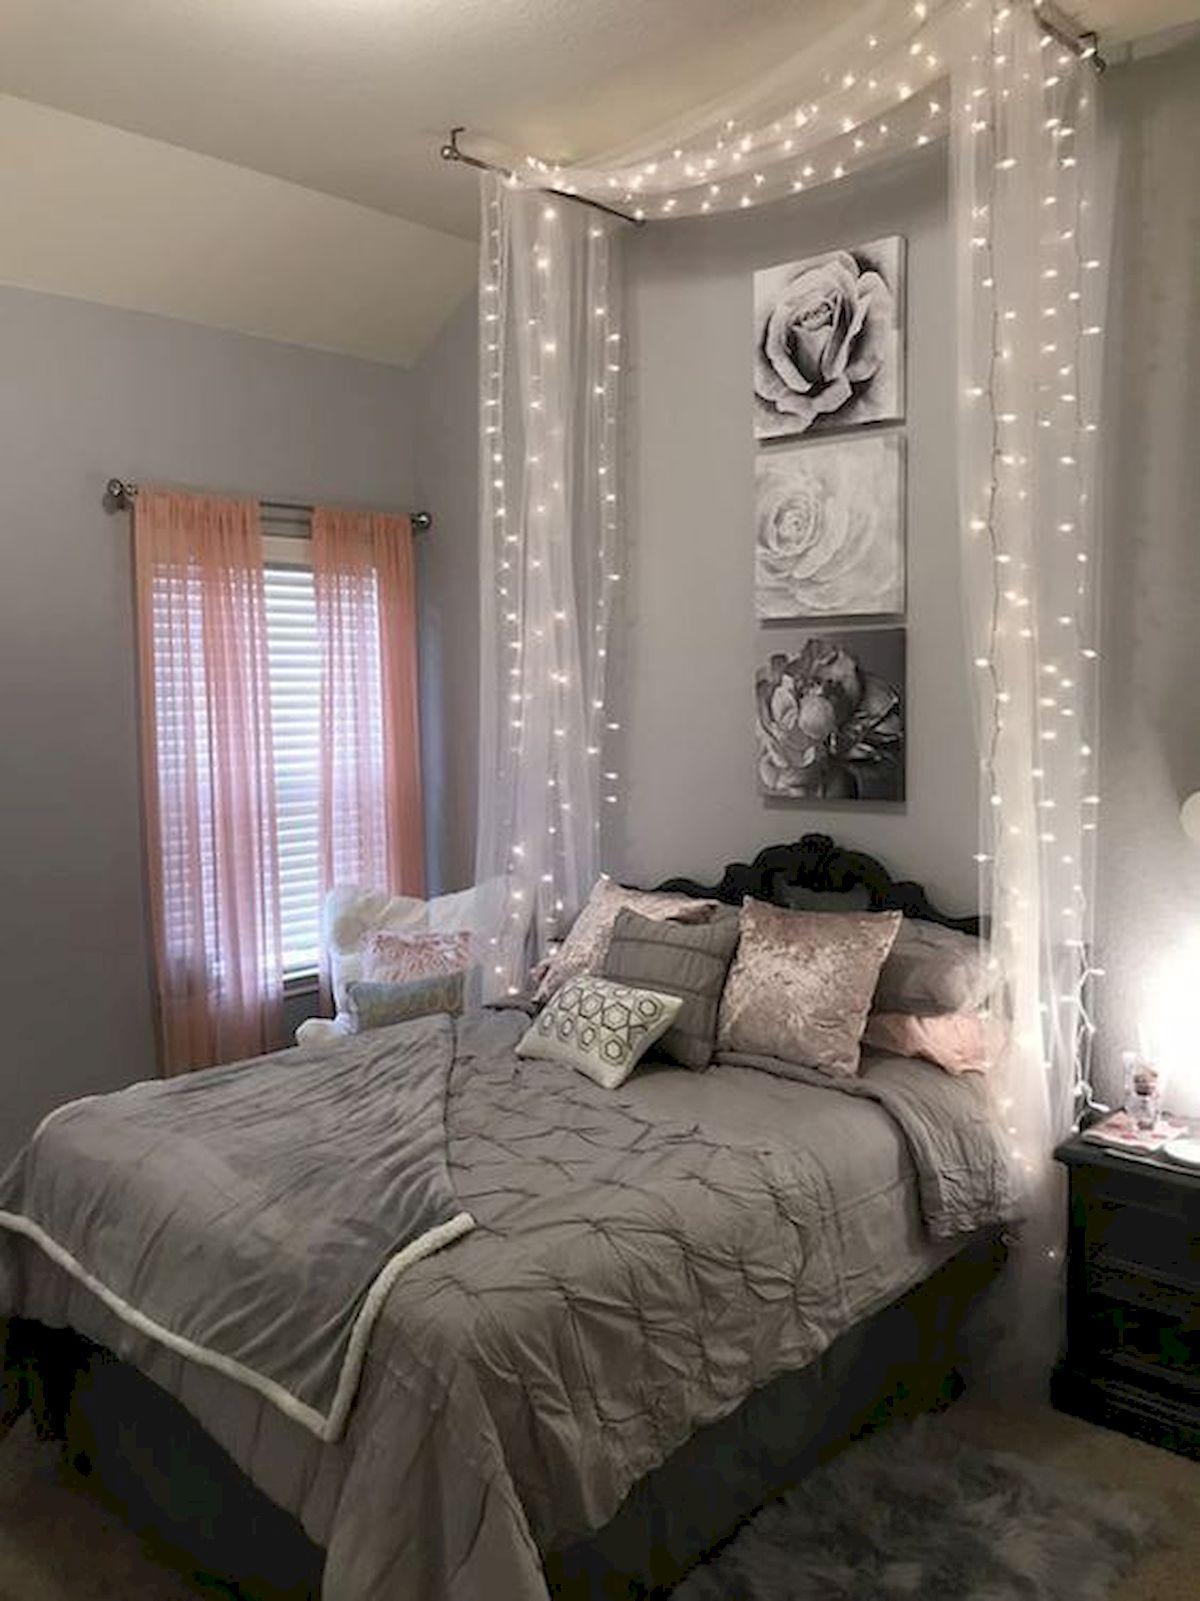 45 Beautiful Bedroom Decor Ideas for Teens (3)